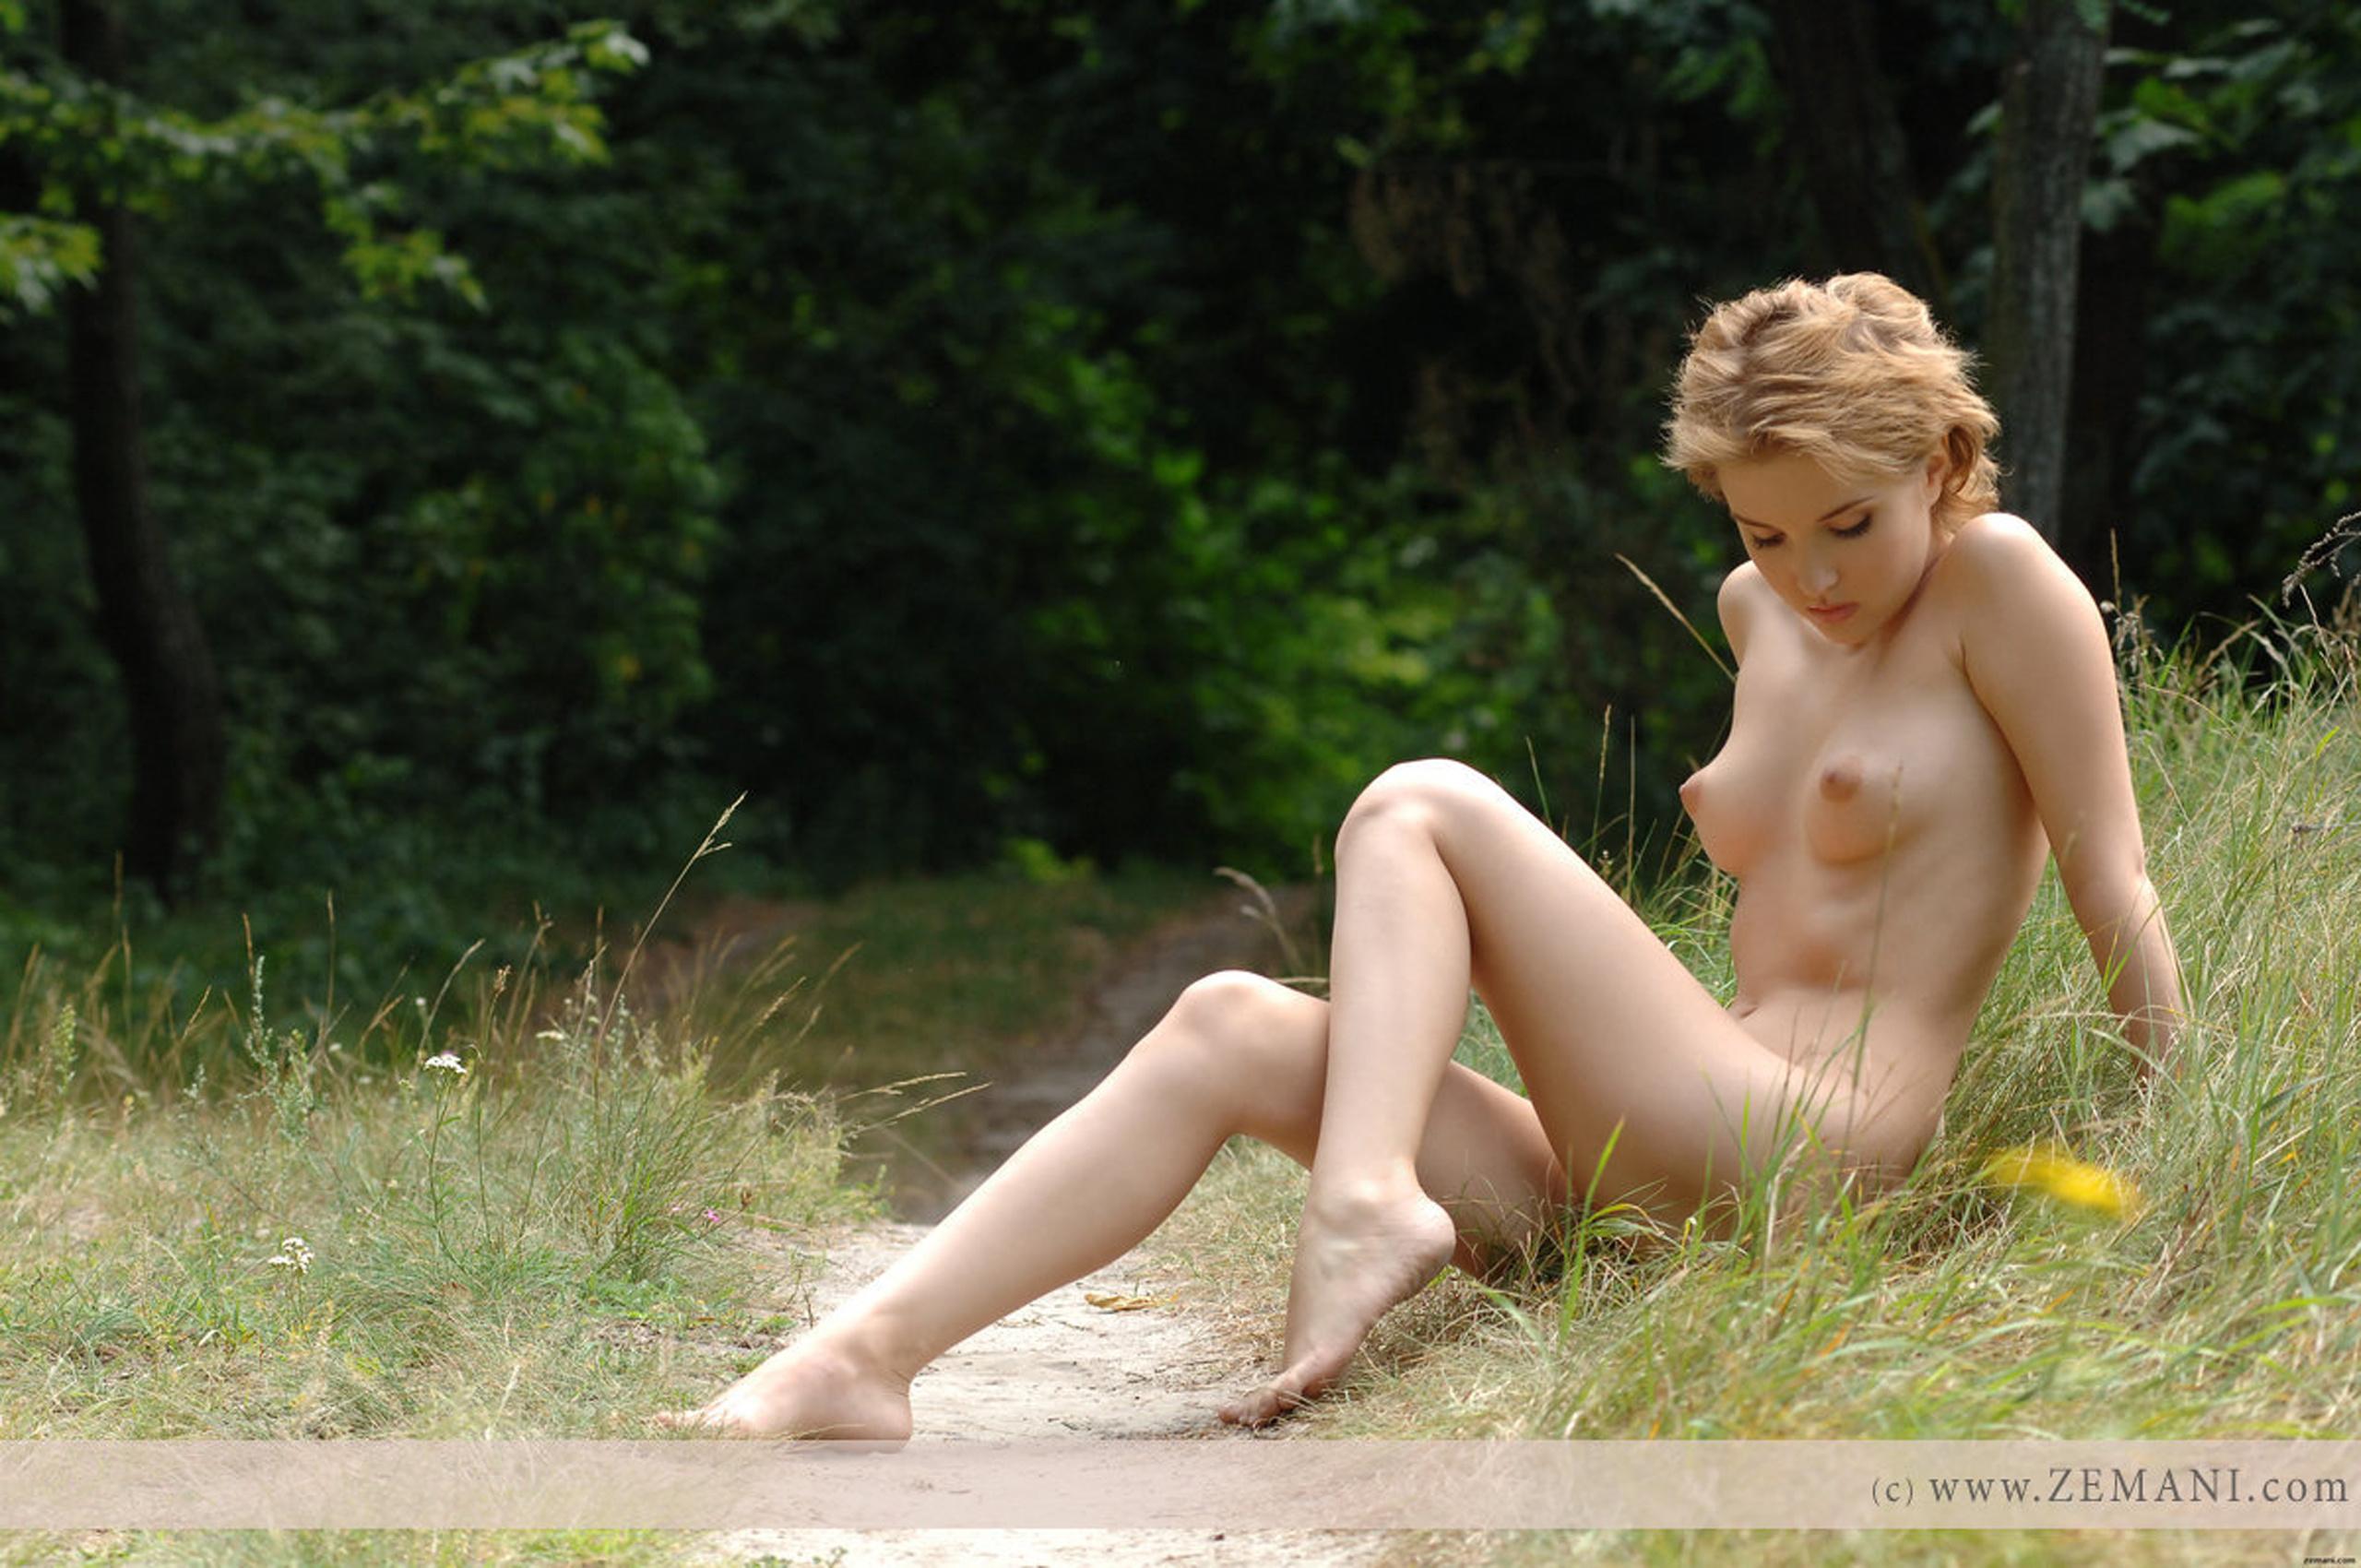 sexy jailbait flashing her boobs